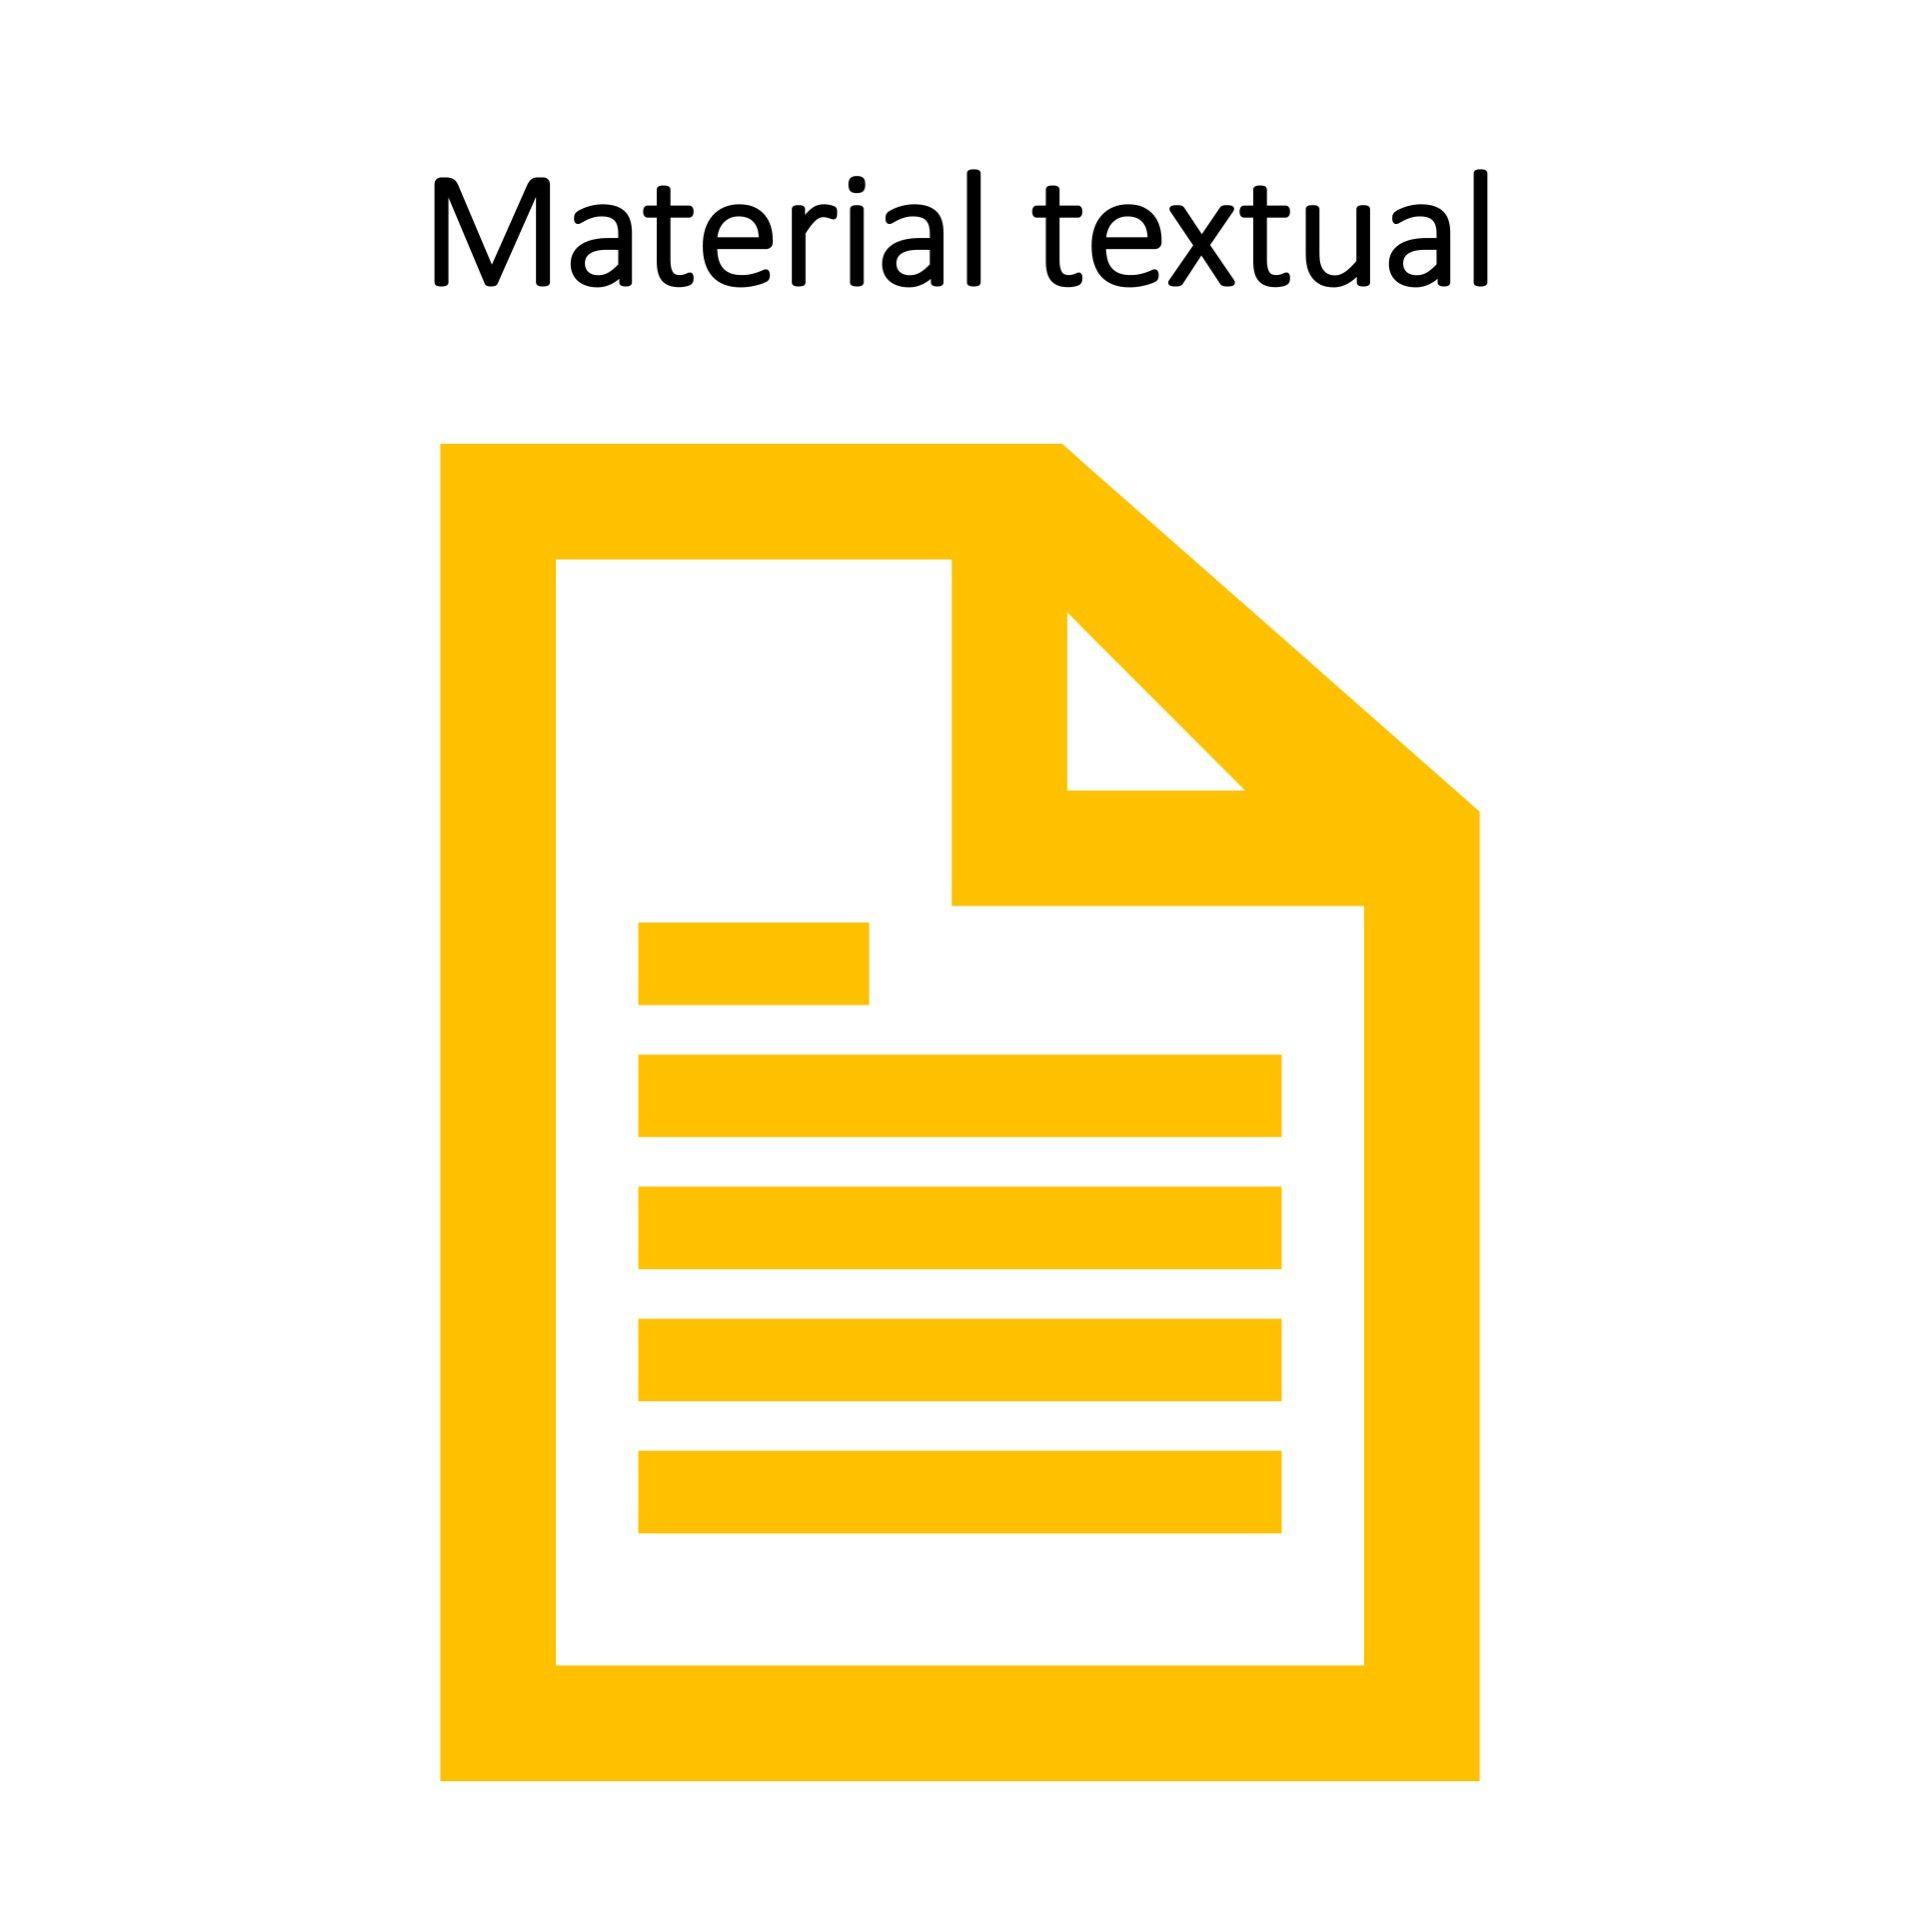 Material textual